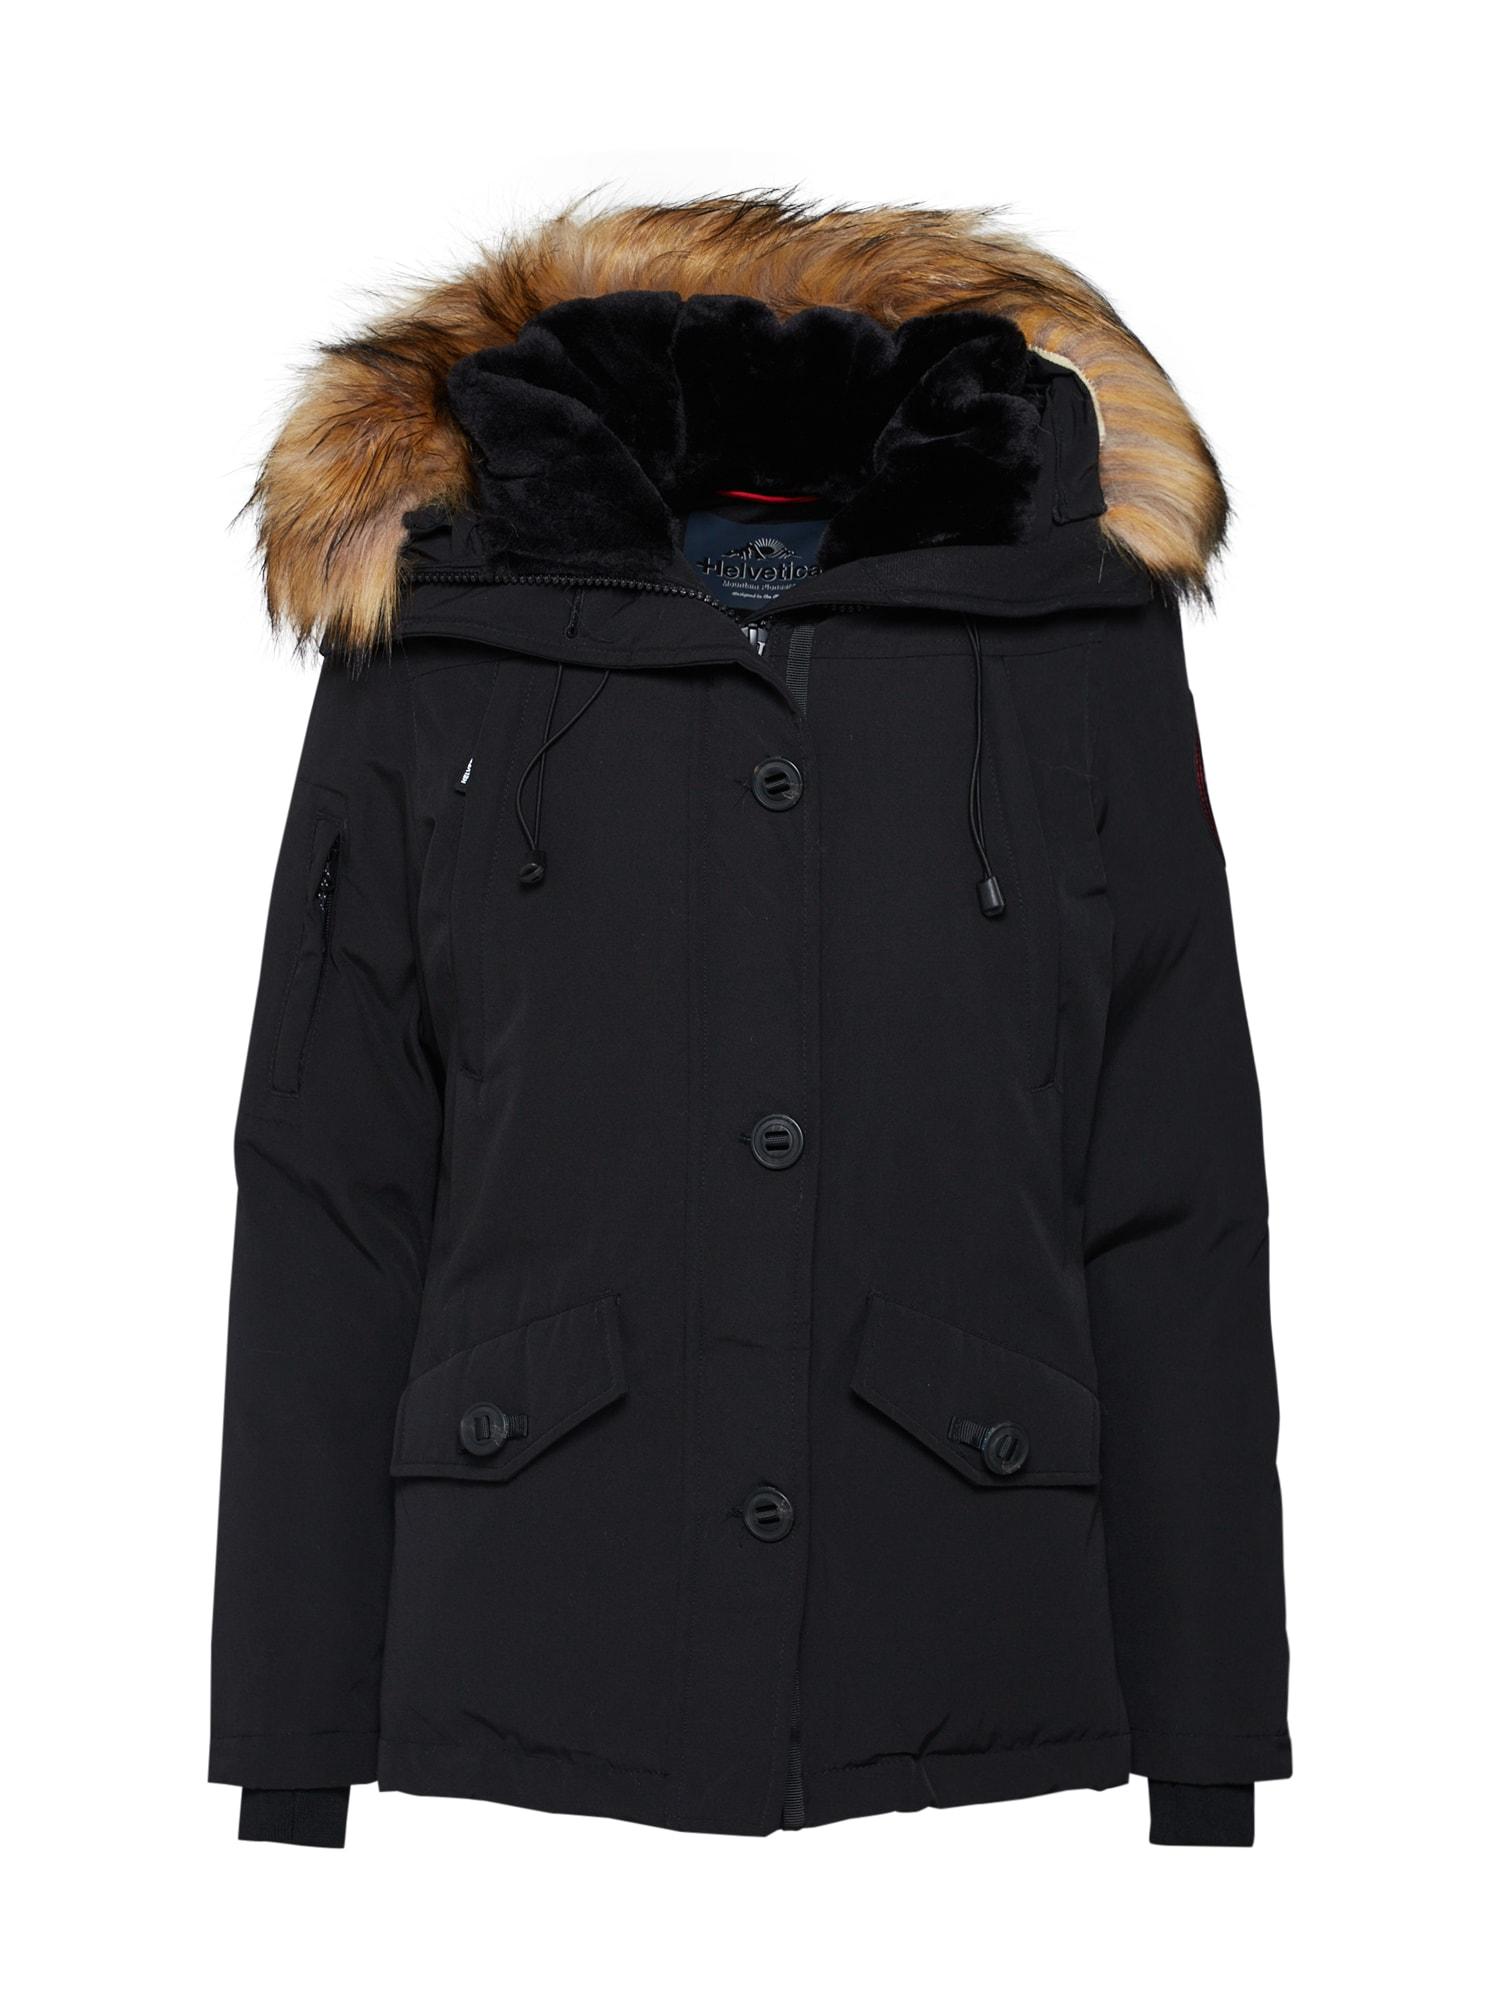 Zimní bunda Ontario černá Helvetica Mountain Pioneers